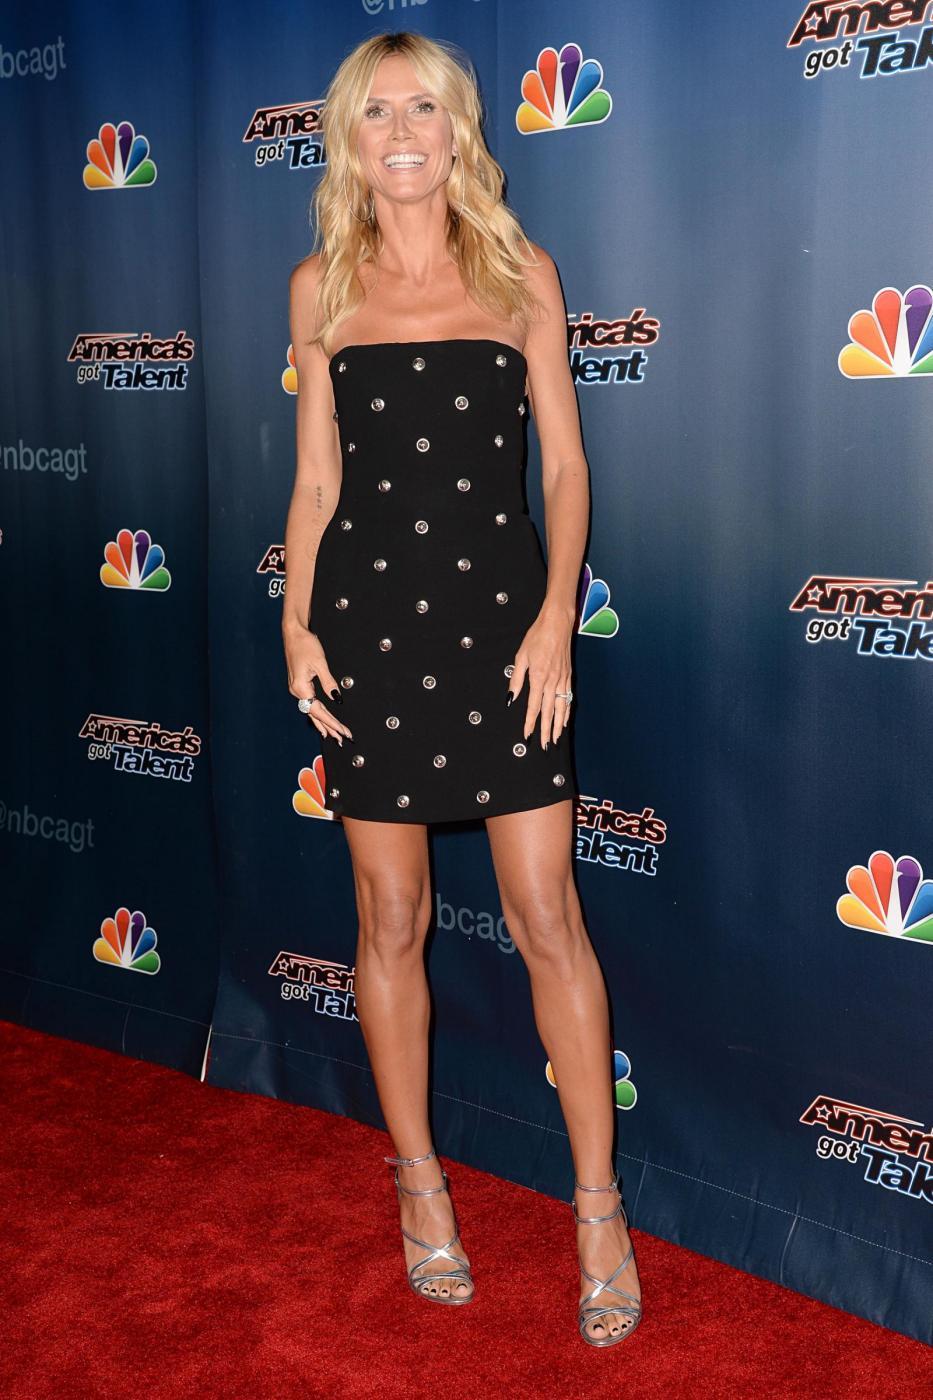 Heidi Klum, mini abito e tacchi per America's Got Talent 6